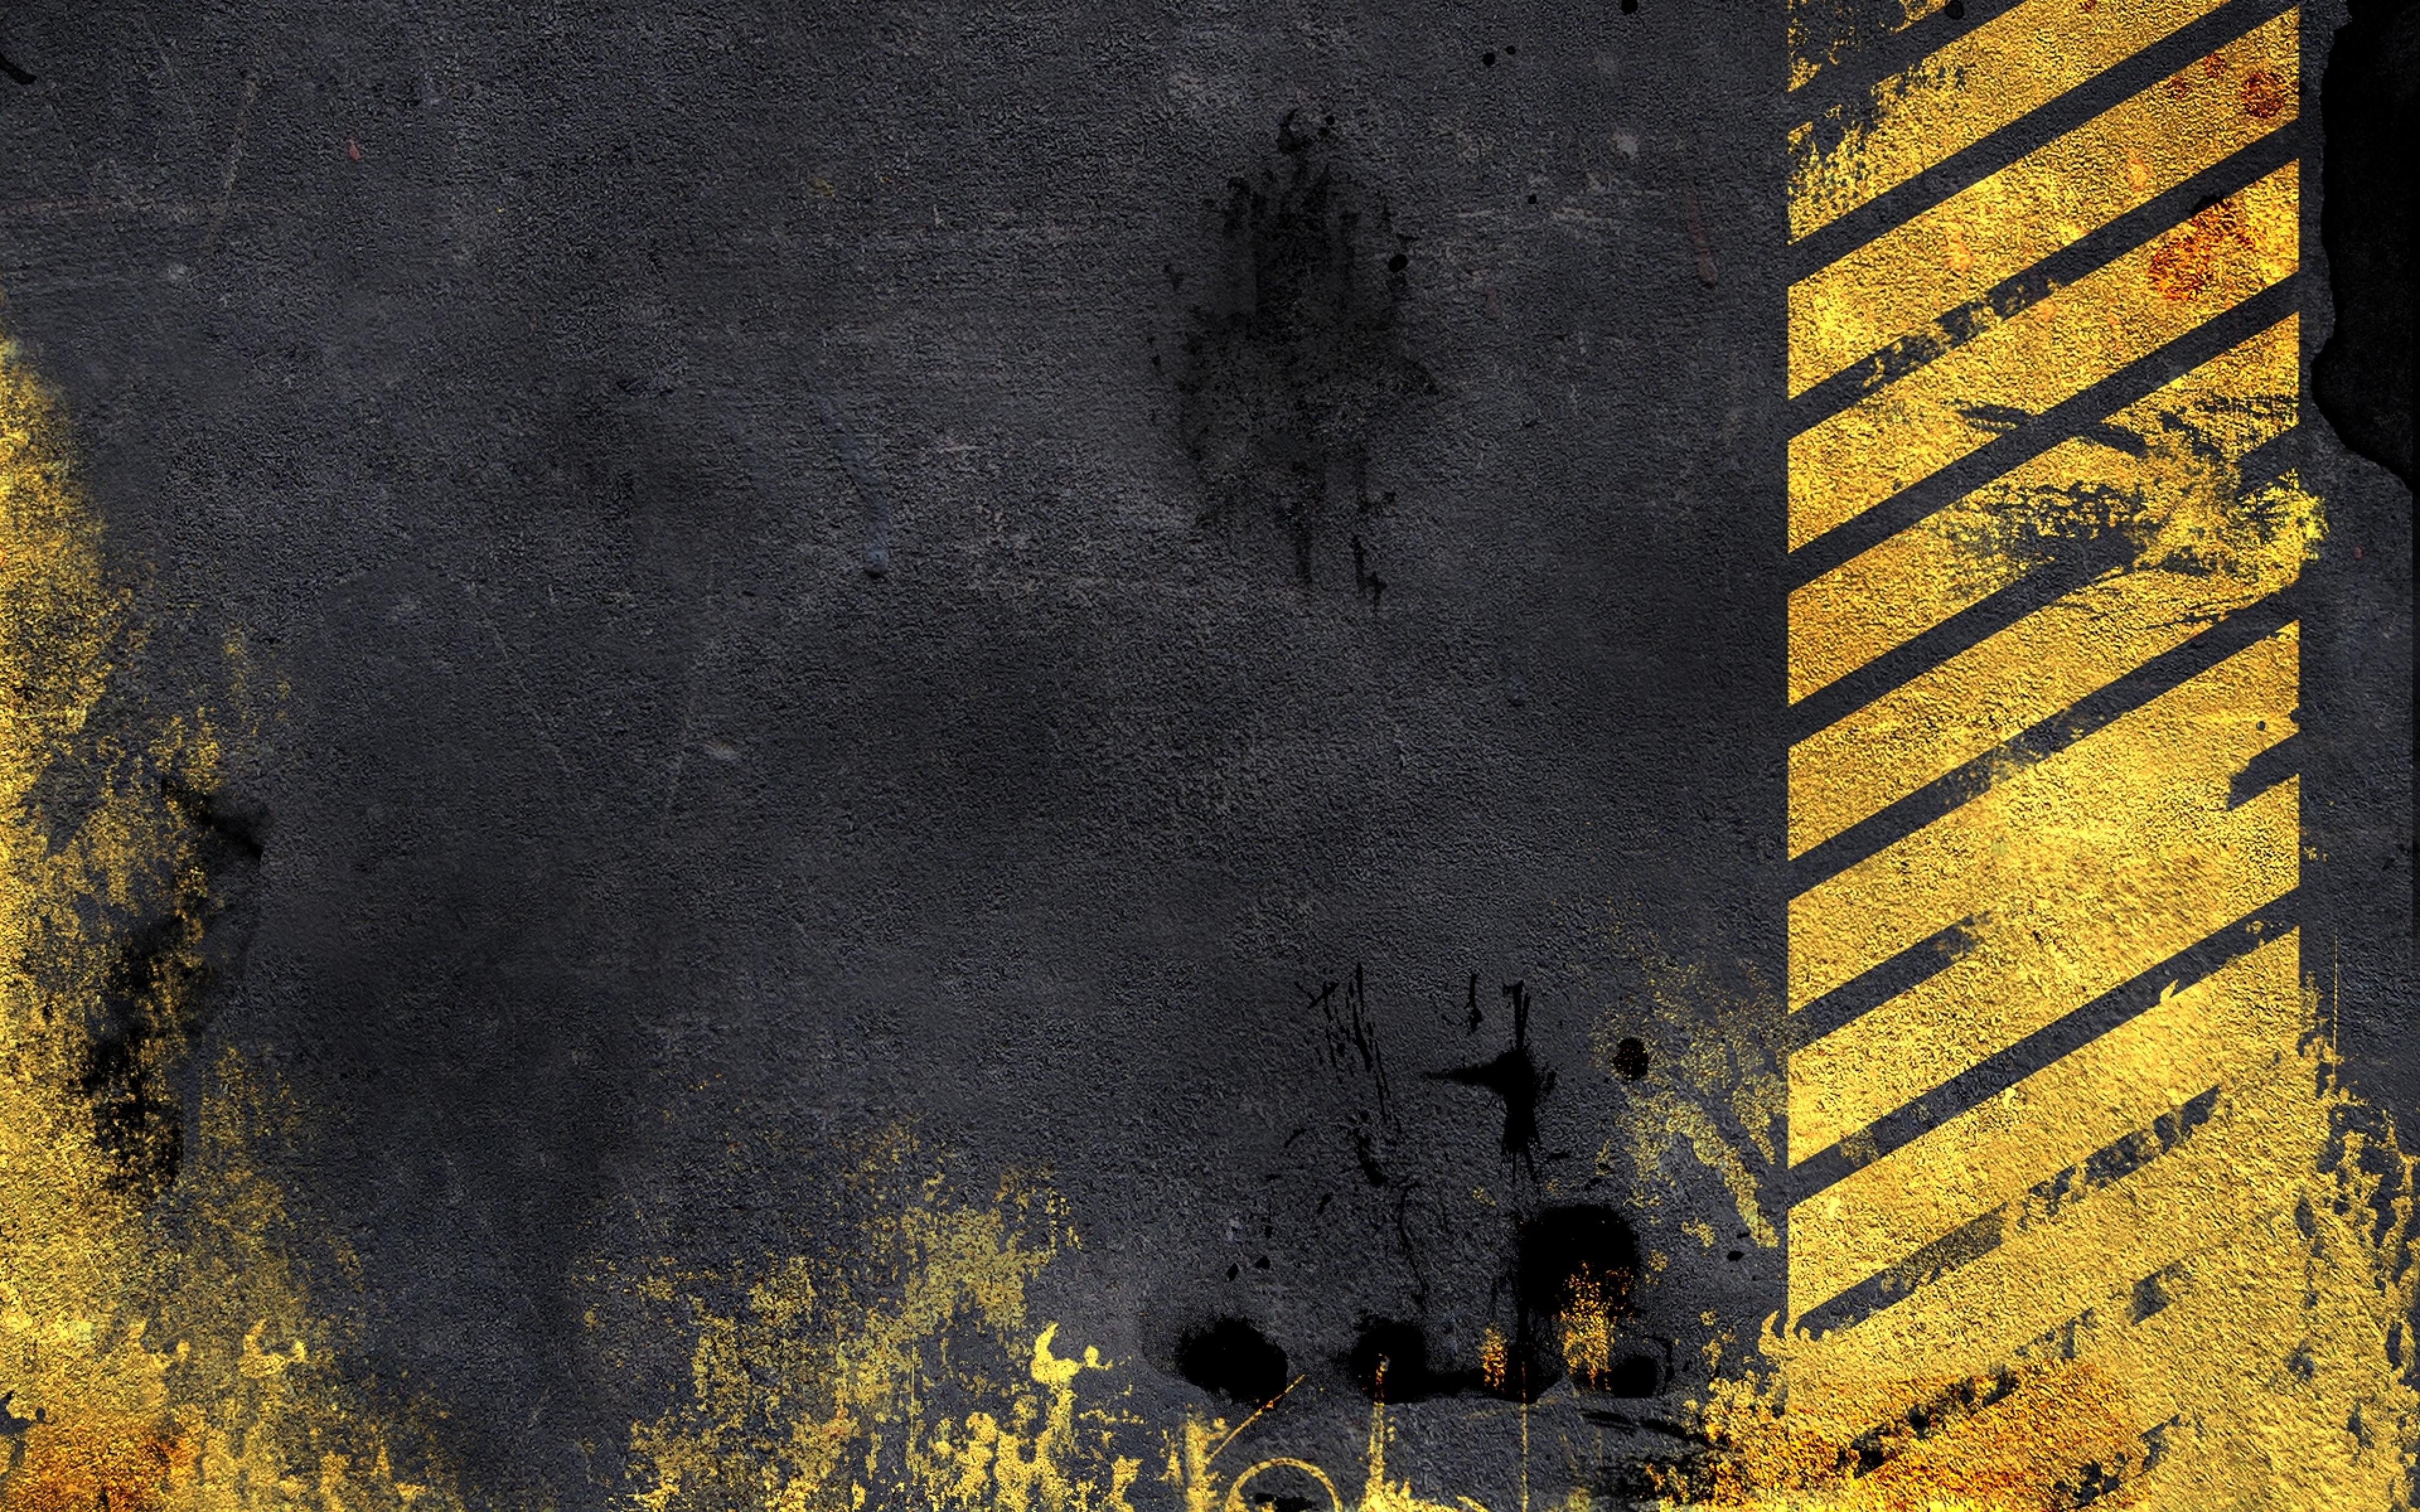 4k asphalt wallpapers high quality download free - Wallpaper hd 4k ...